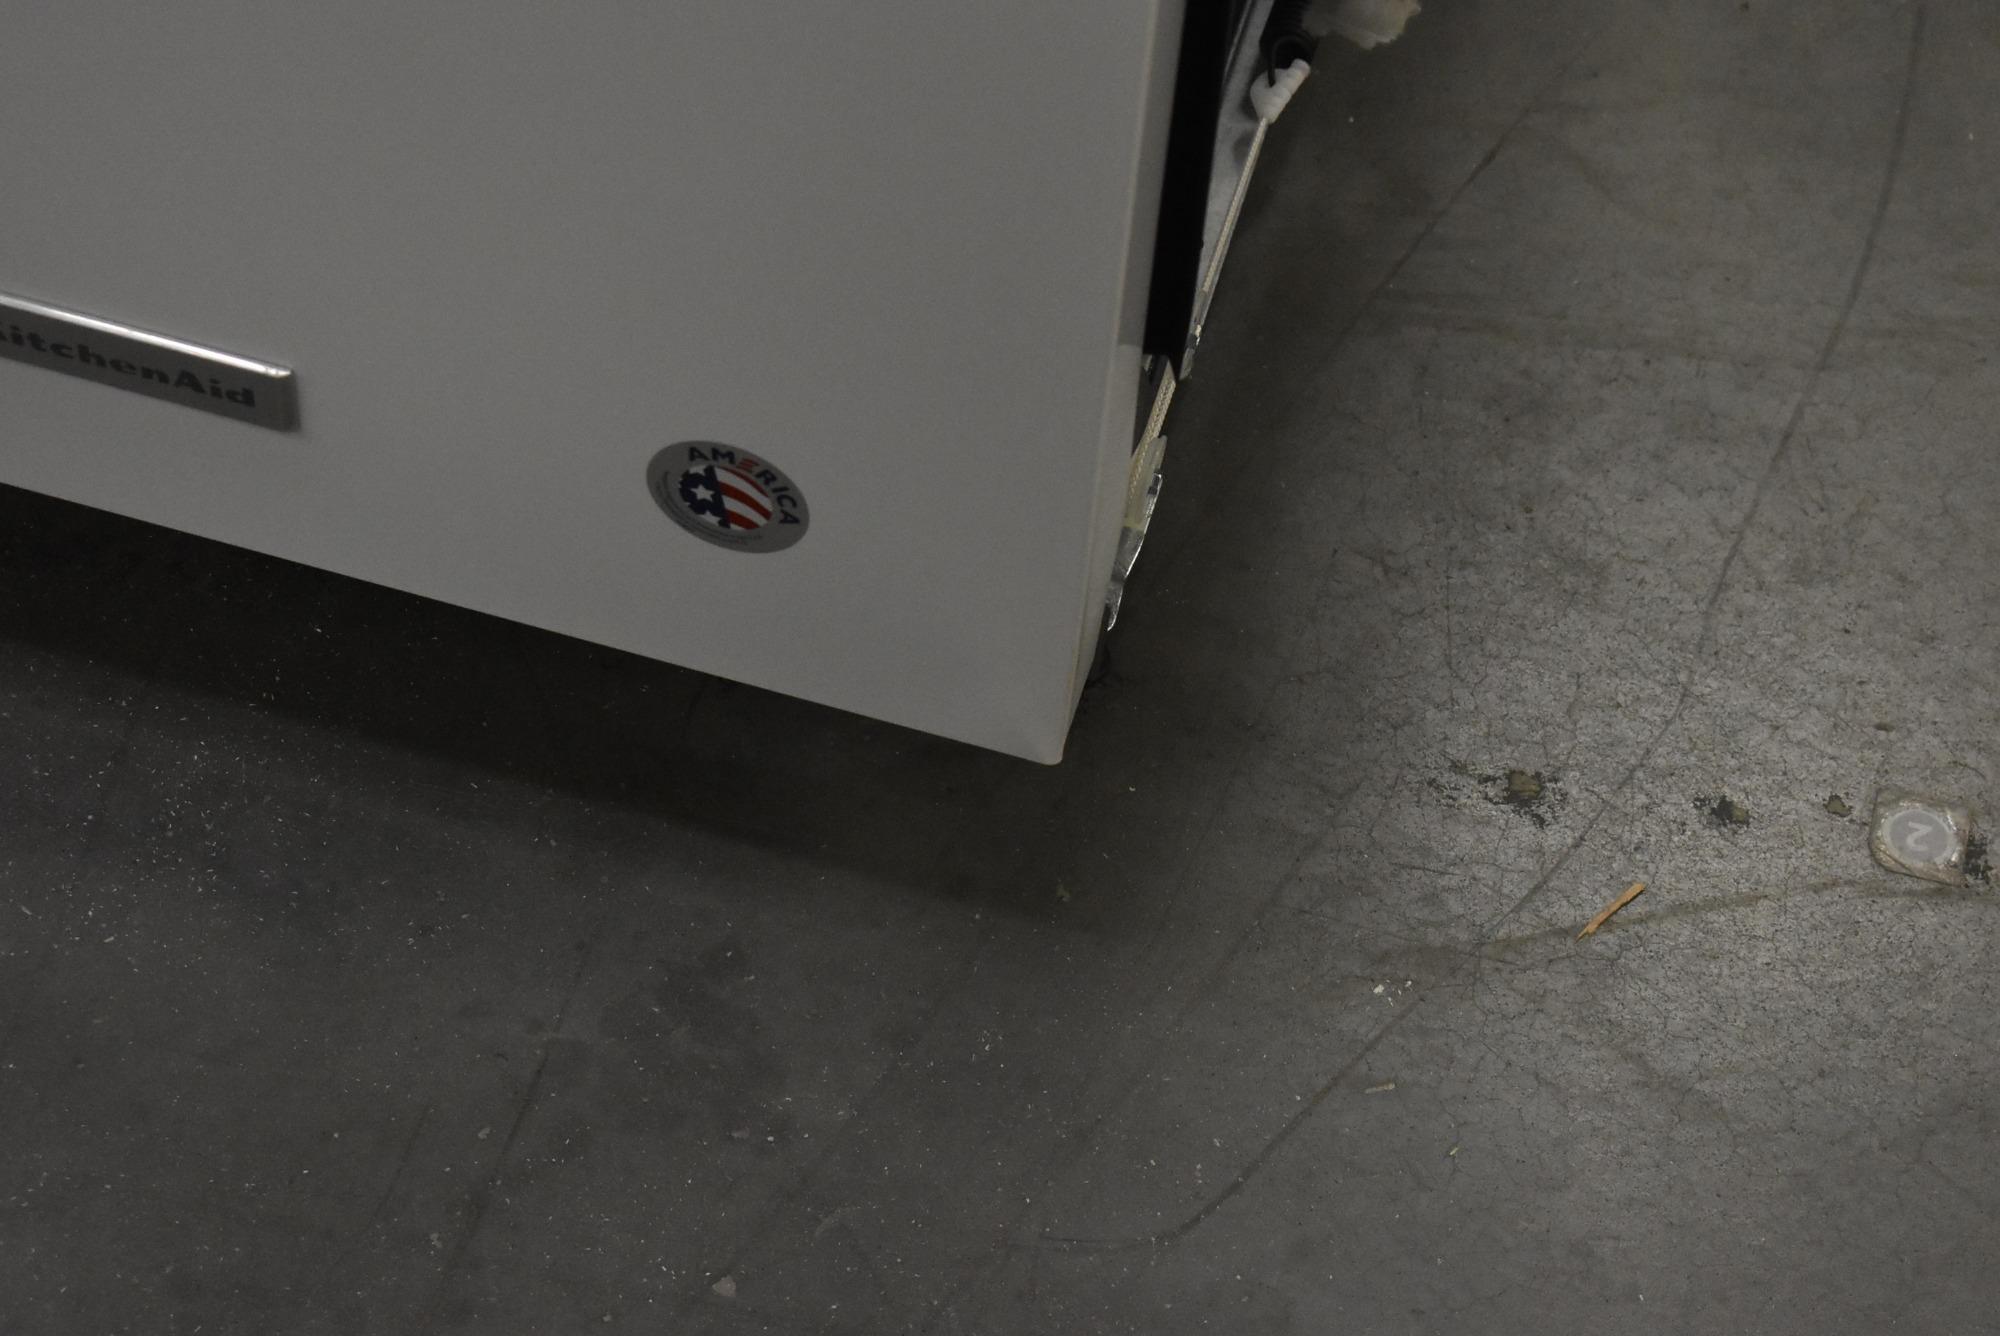 Kitchenaid Dishwasher White >> Kitchenaid Kdte234gwh 24 White Fully Integrated Dishwasher Nob 47865 Hrt